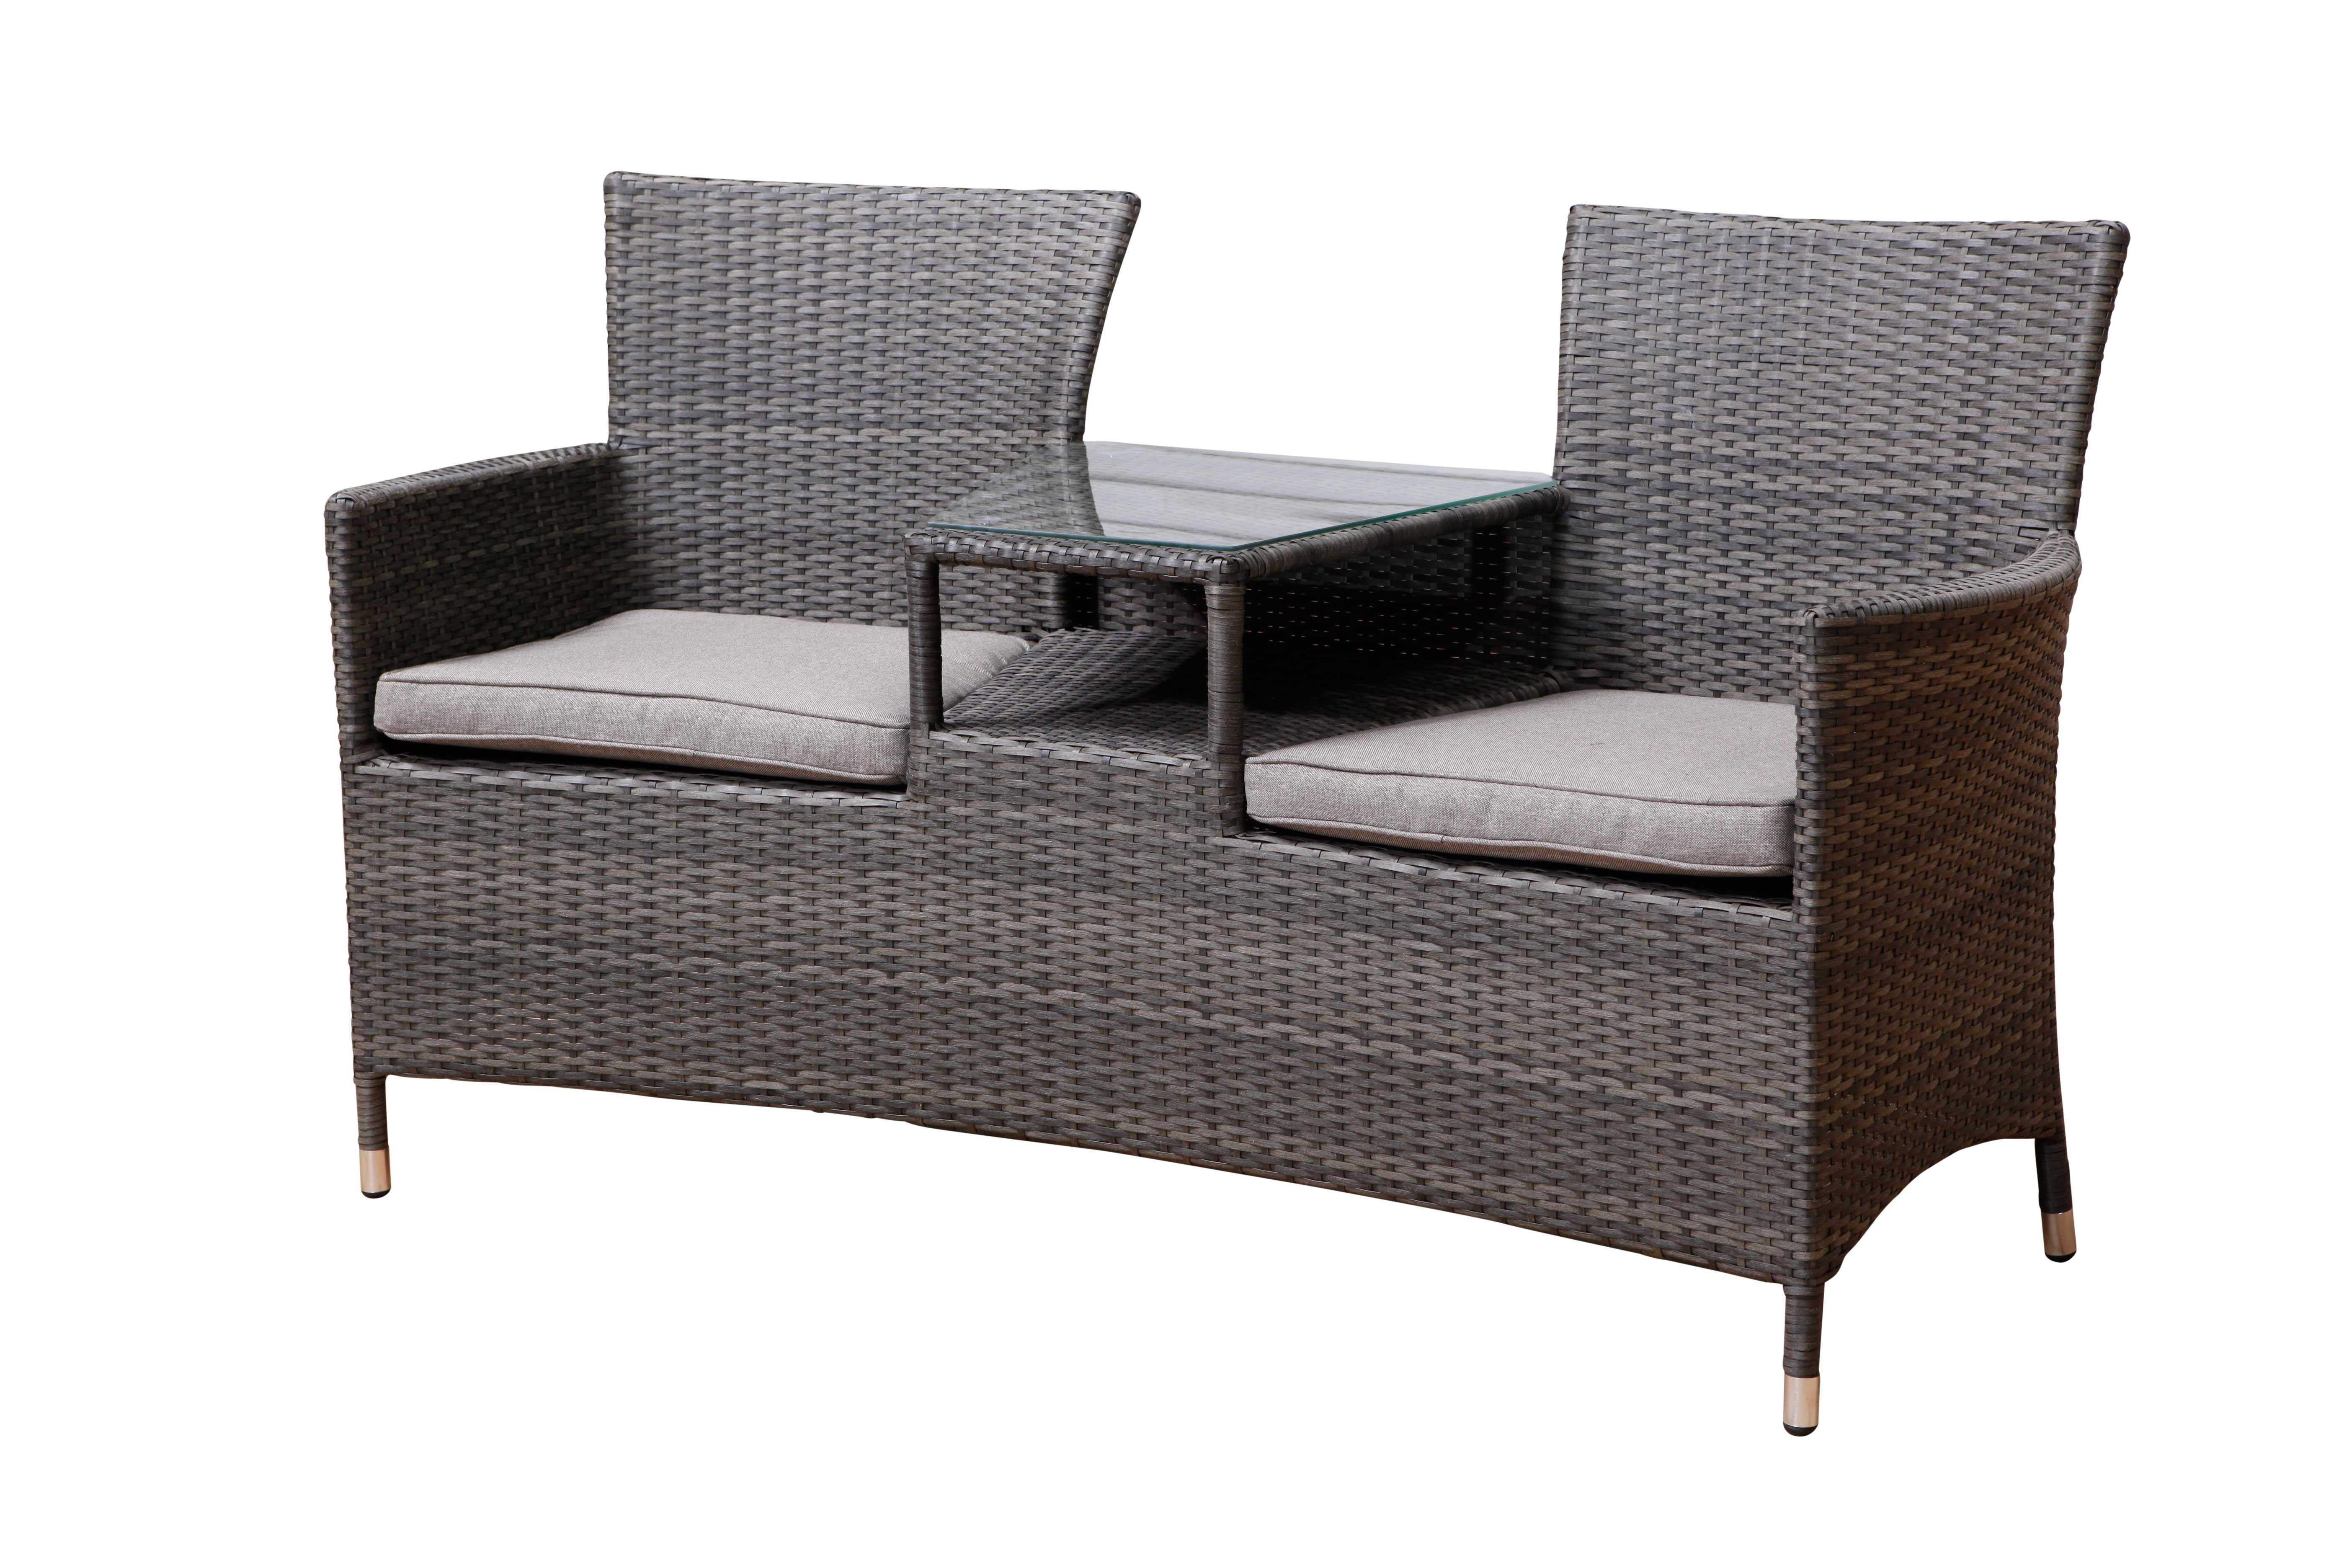 Sofa Tables Perth Wa Oak And Liquidators Hanford Ca Jack Jill Outdoor Seat Available At Drovers Inside